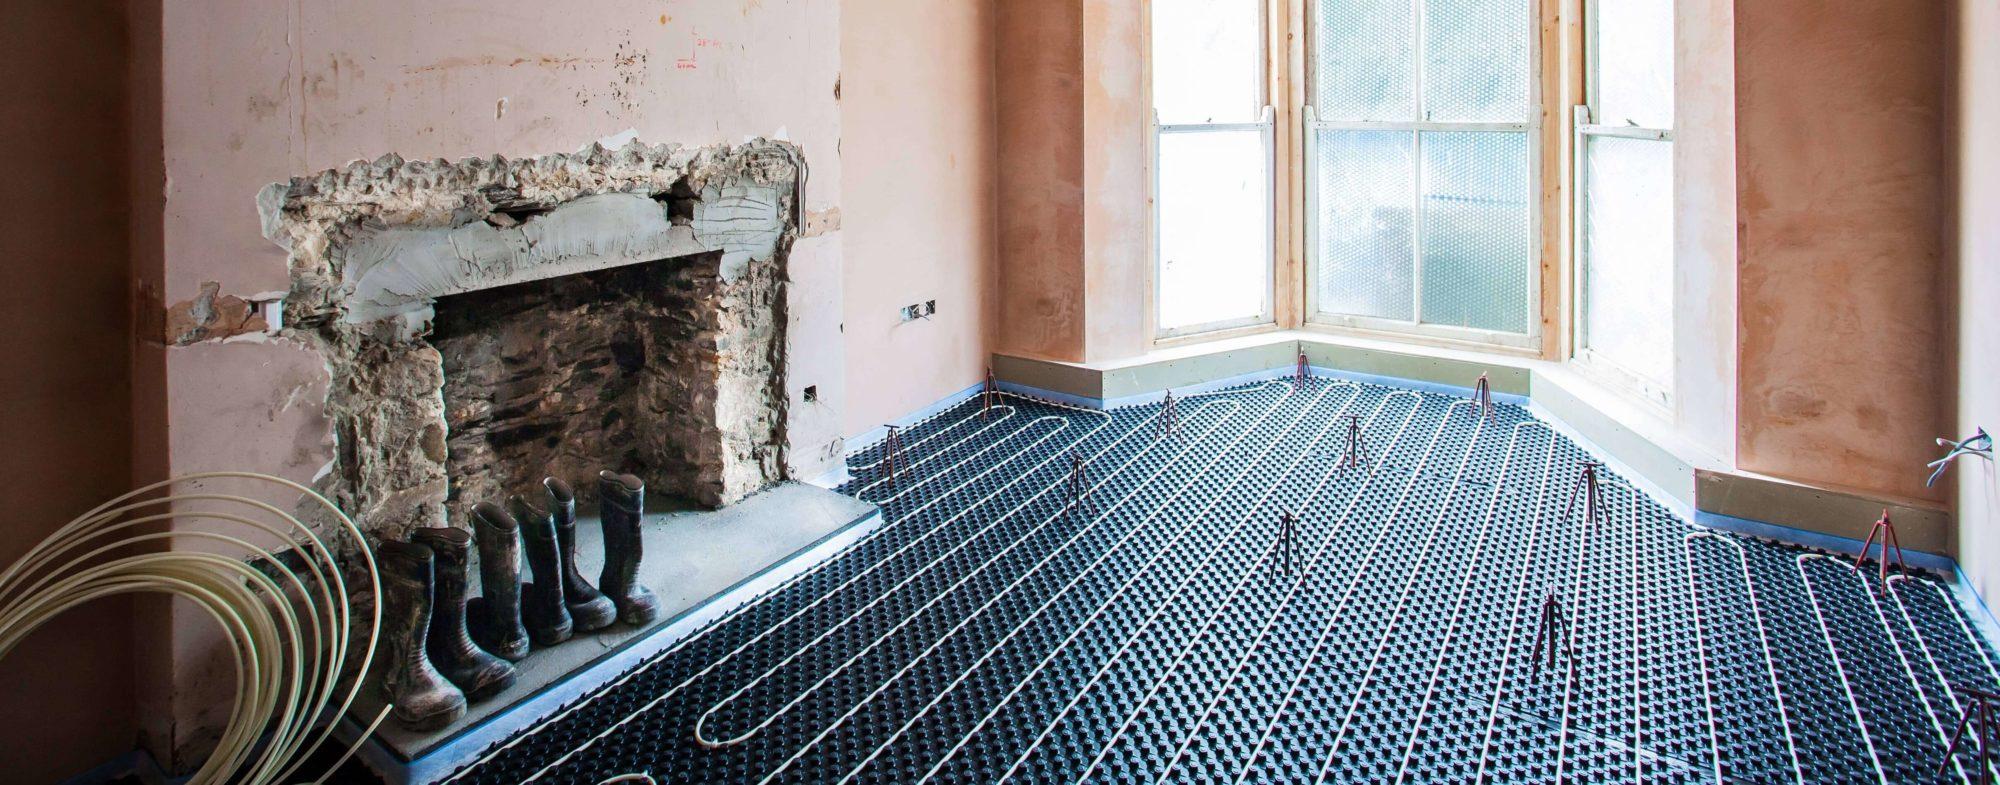 retrofit underfloor heating